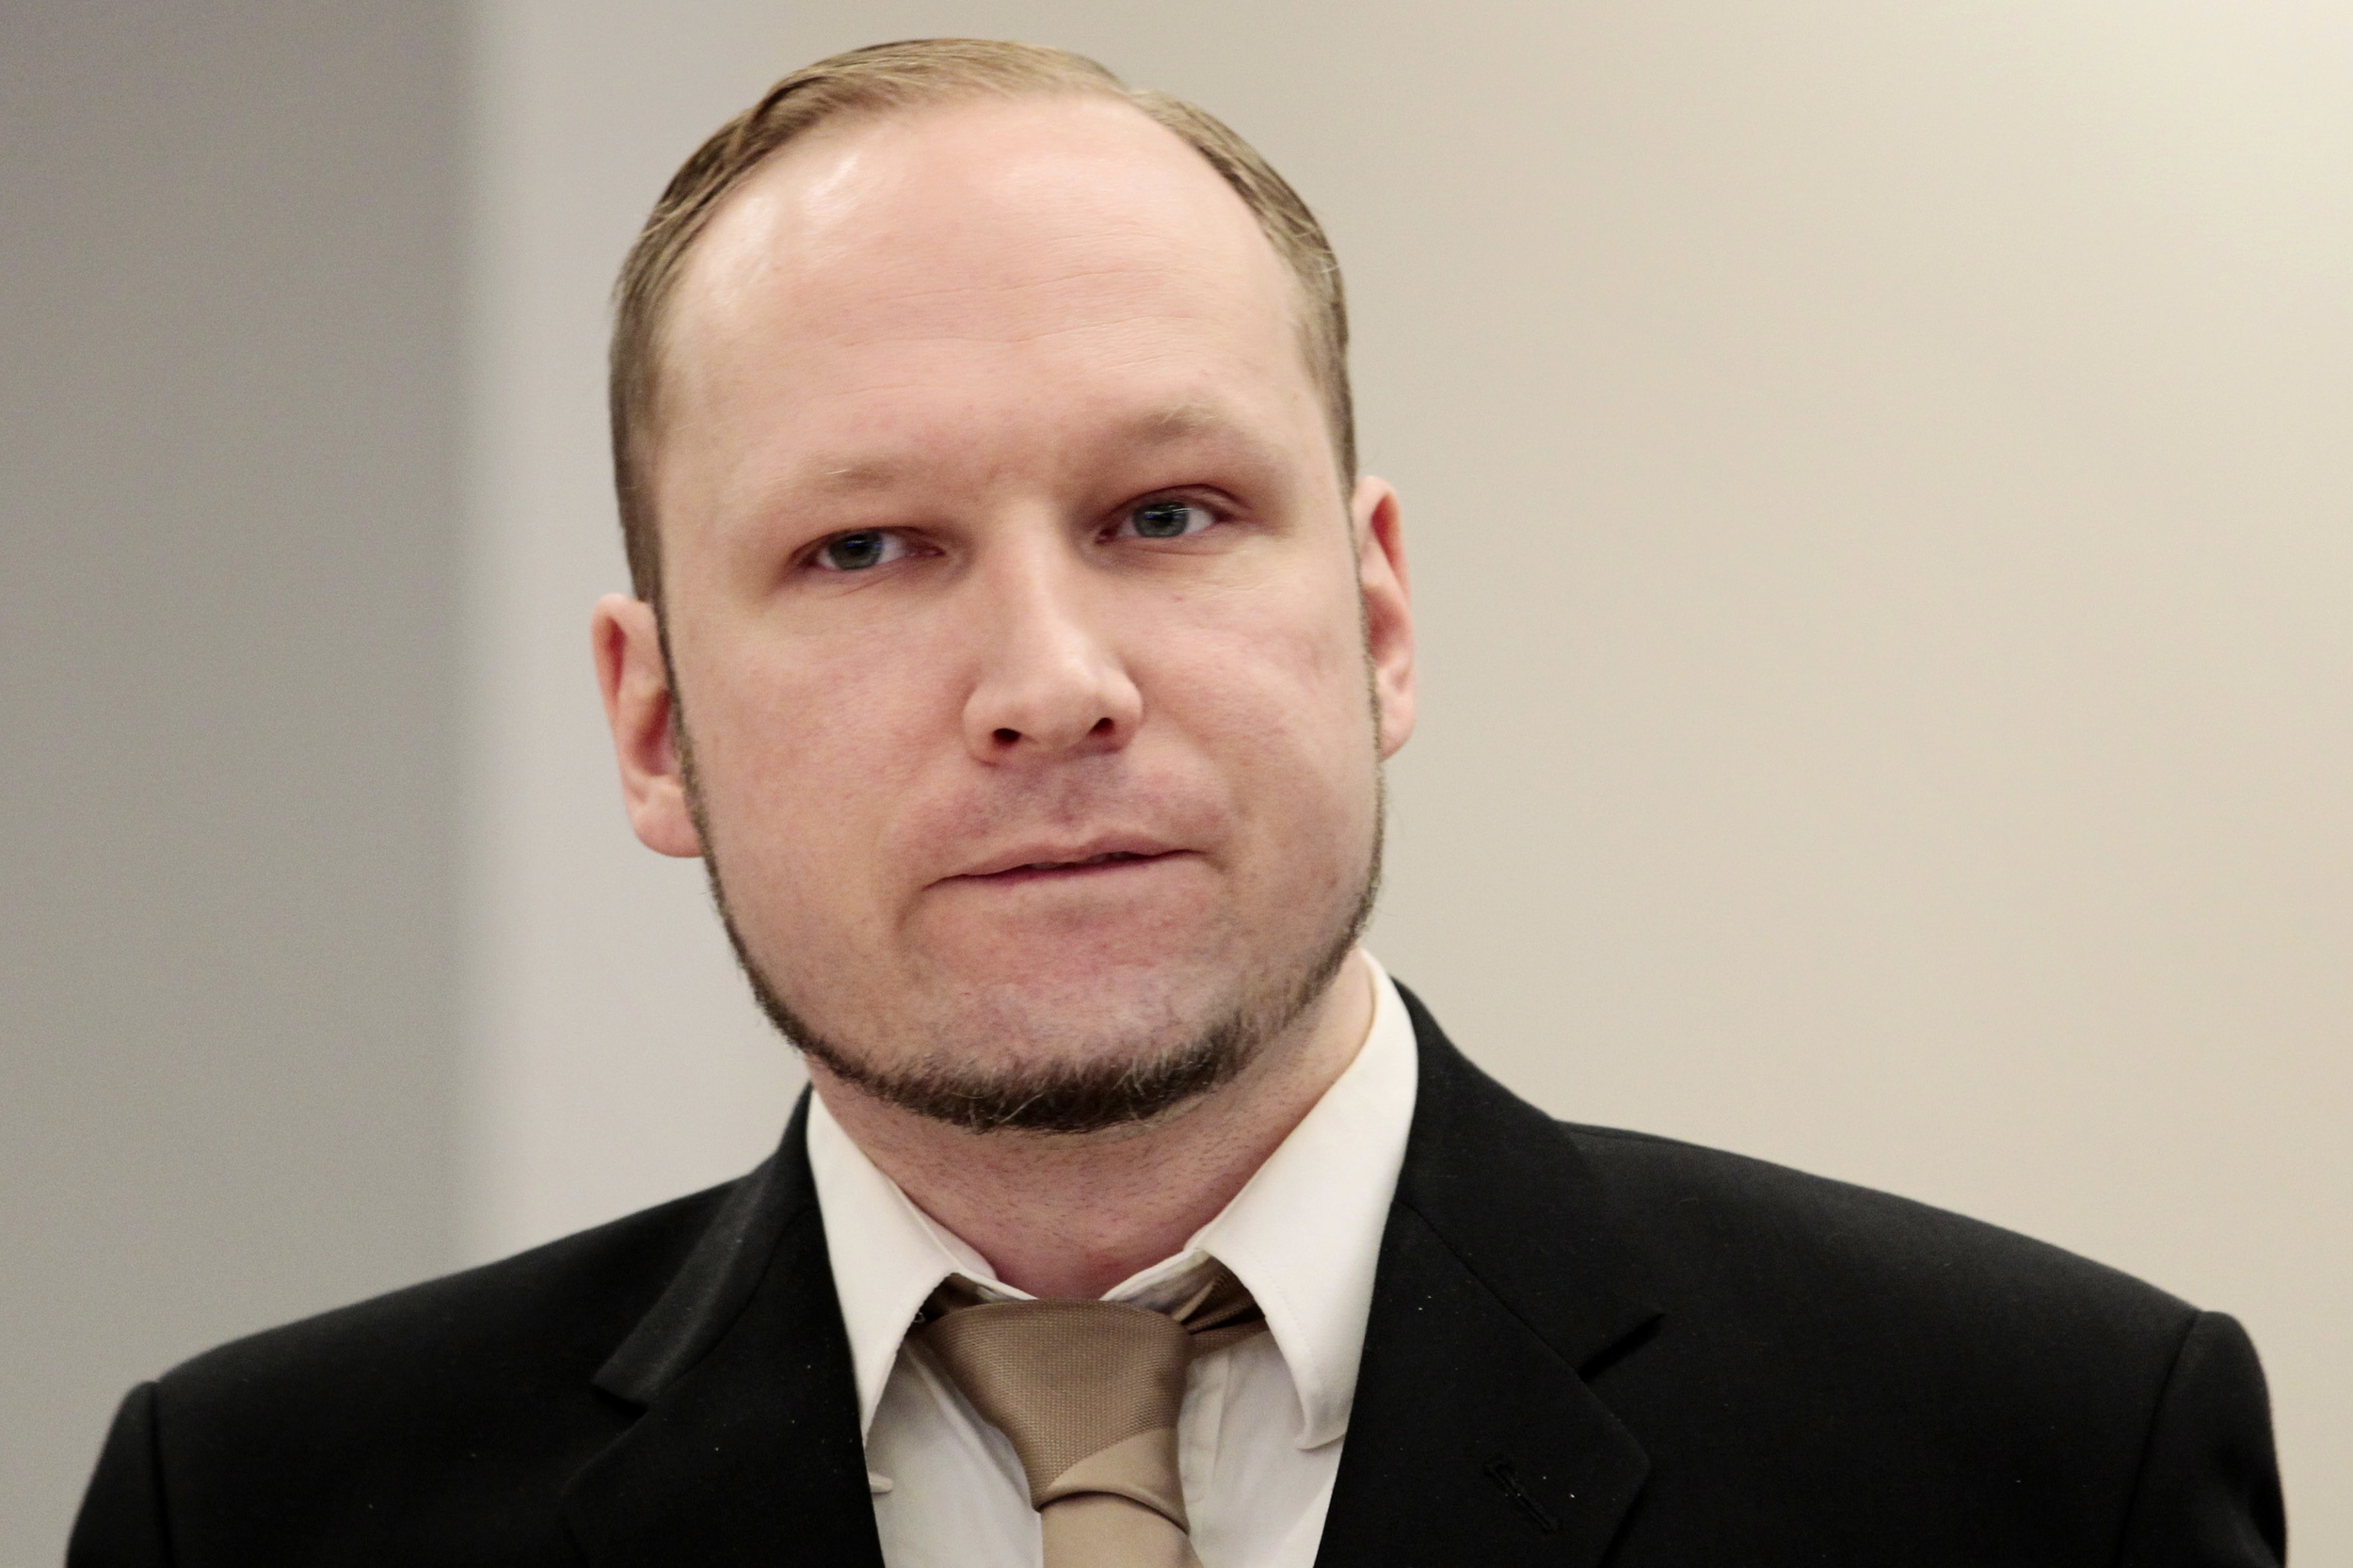 Anders Breivik. Photo by Press Association